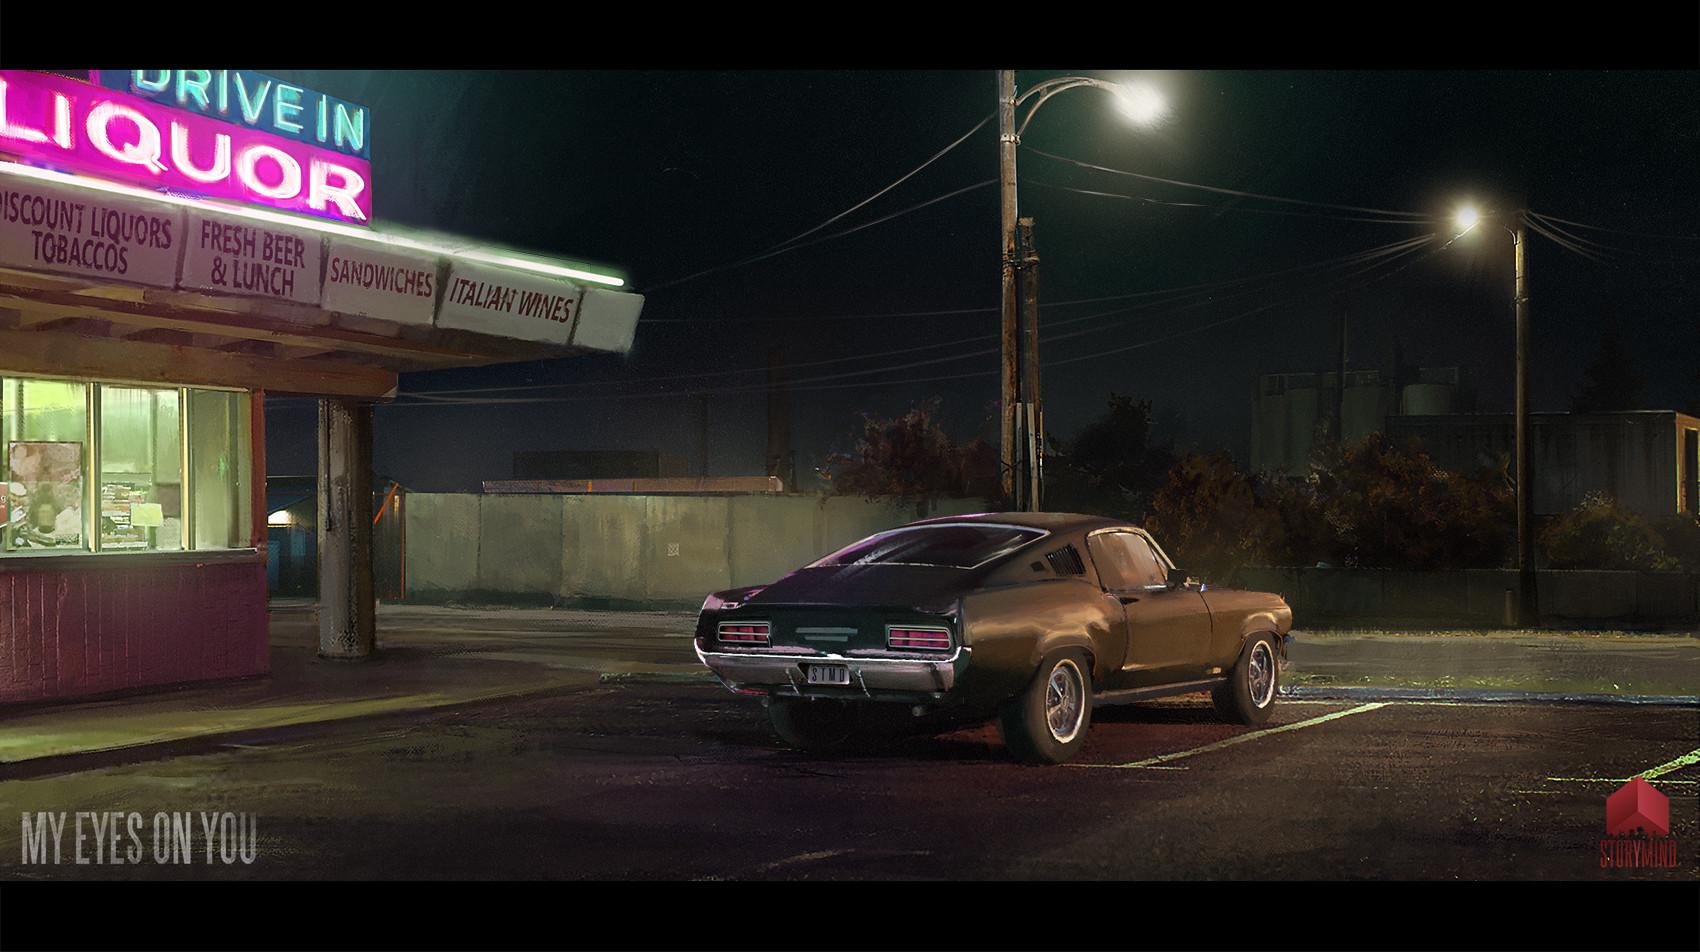 Tony skeor trailer shot s